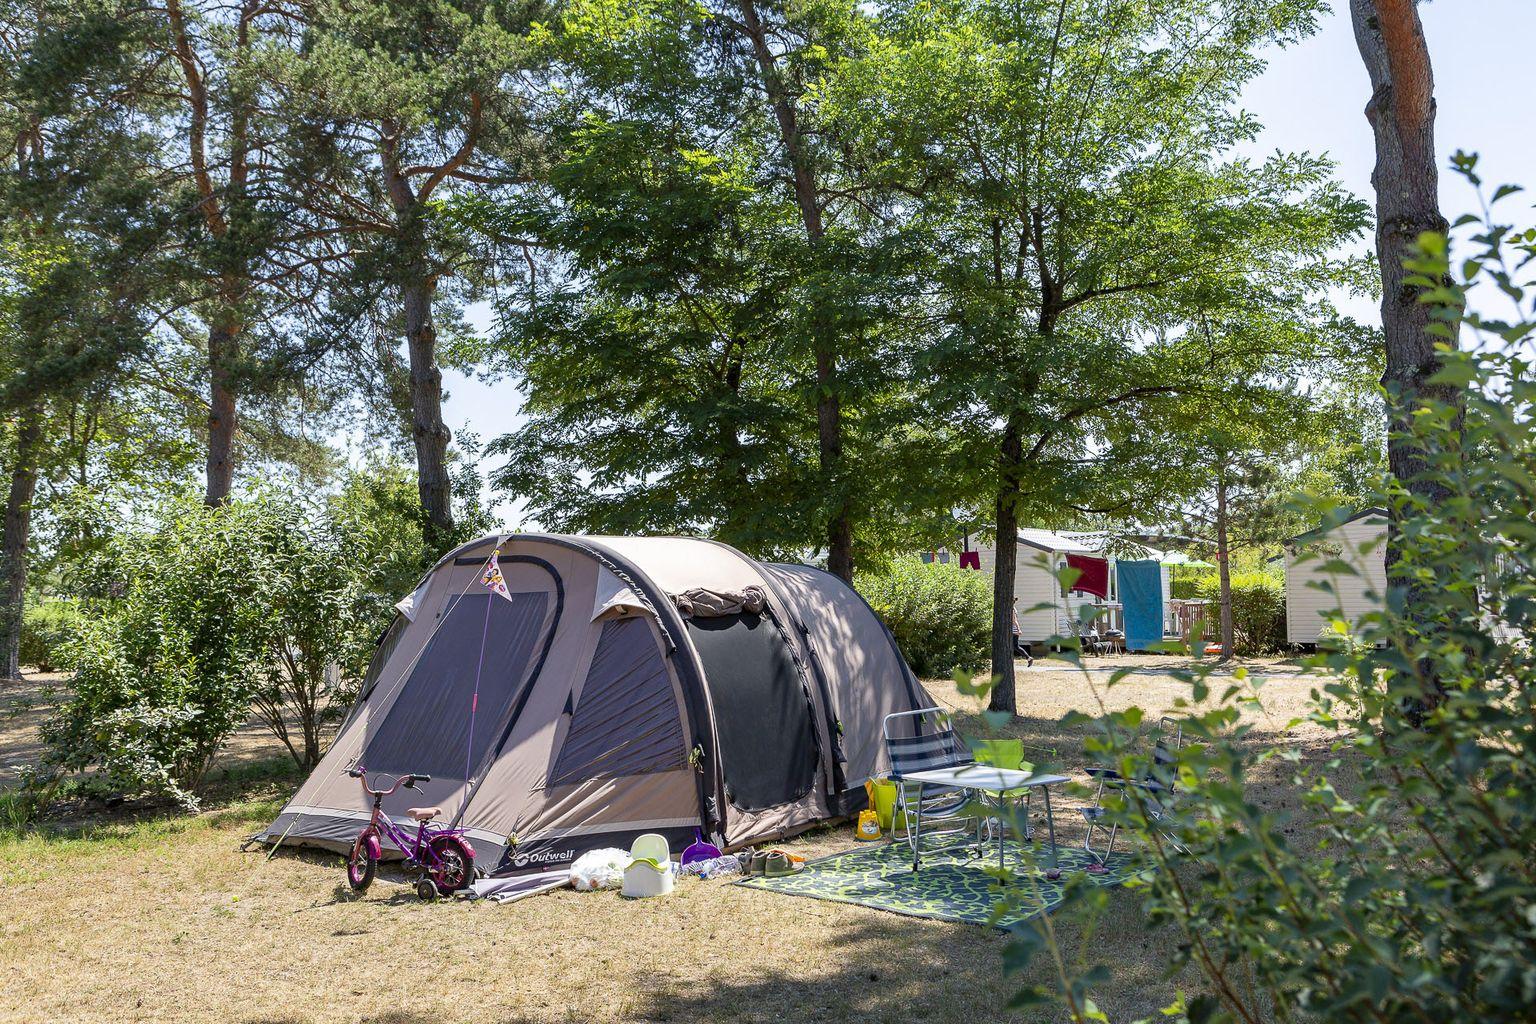 Emplacement - Forfait ** - Camping Sandaya Les Alicourts